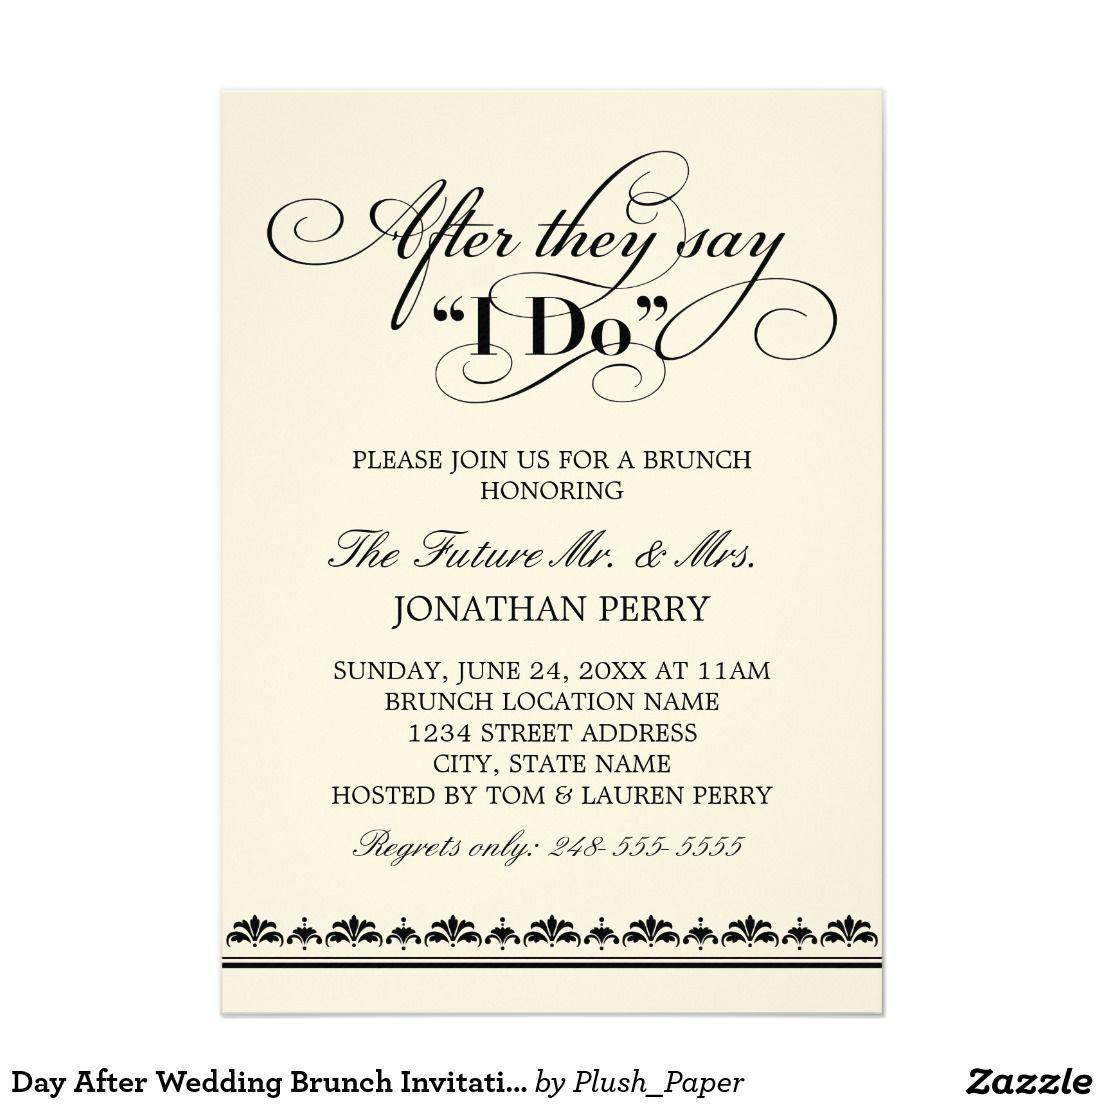 day after wedding brunch invitation wedding vows vintage wedding